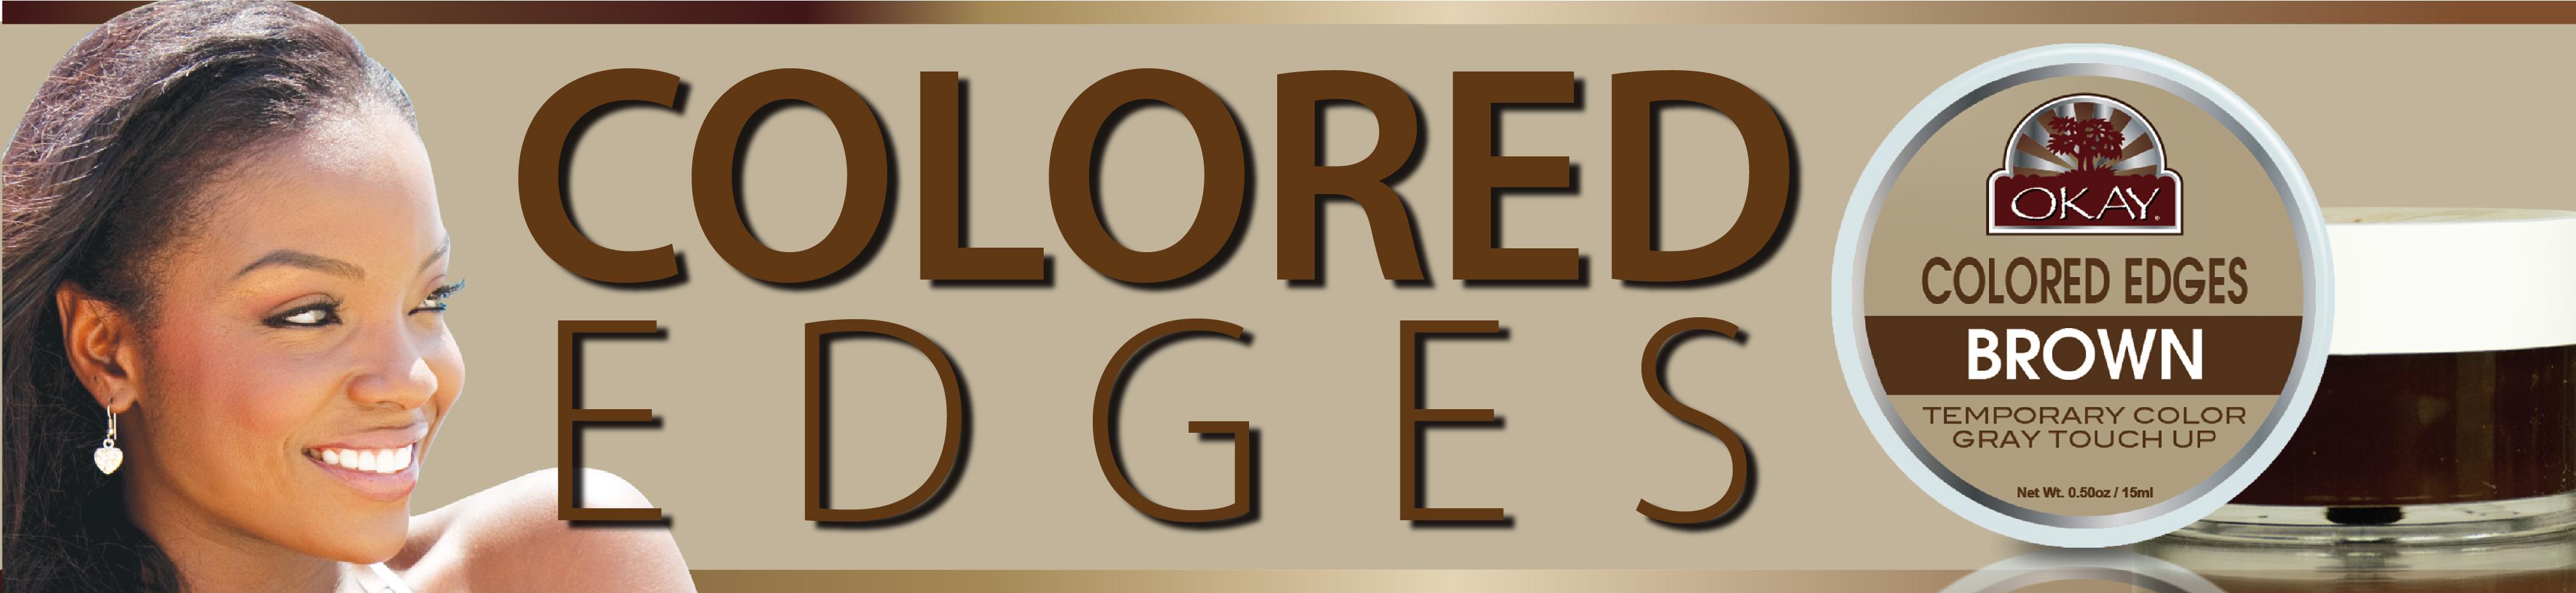 coloered-edges-06-06.jpg